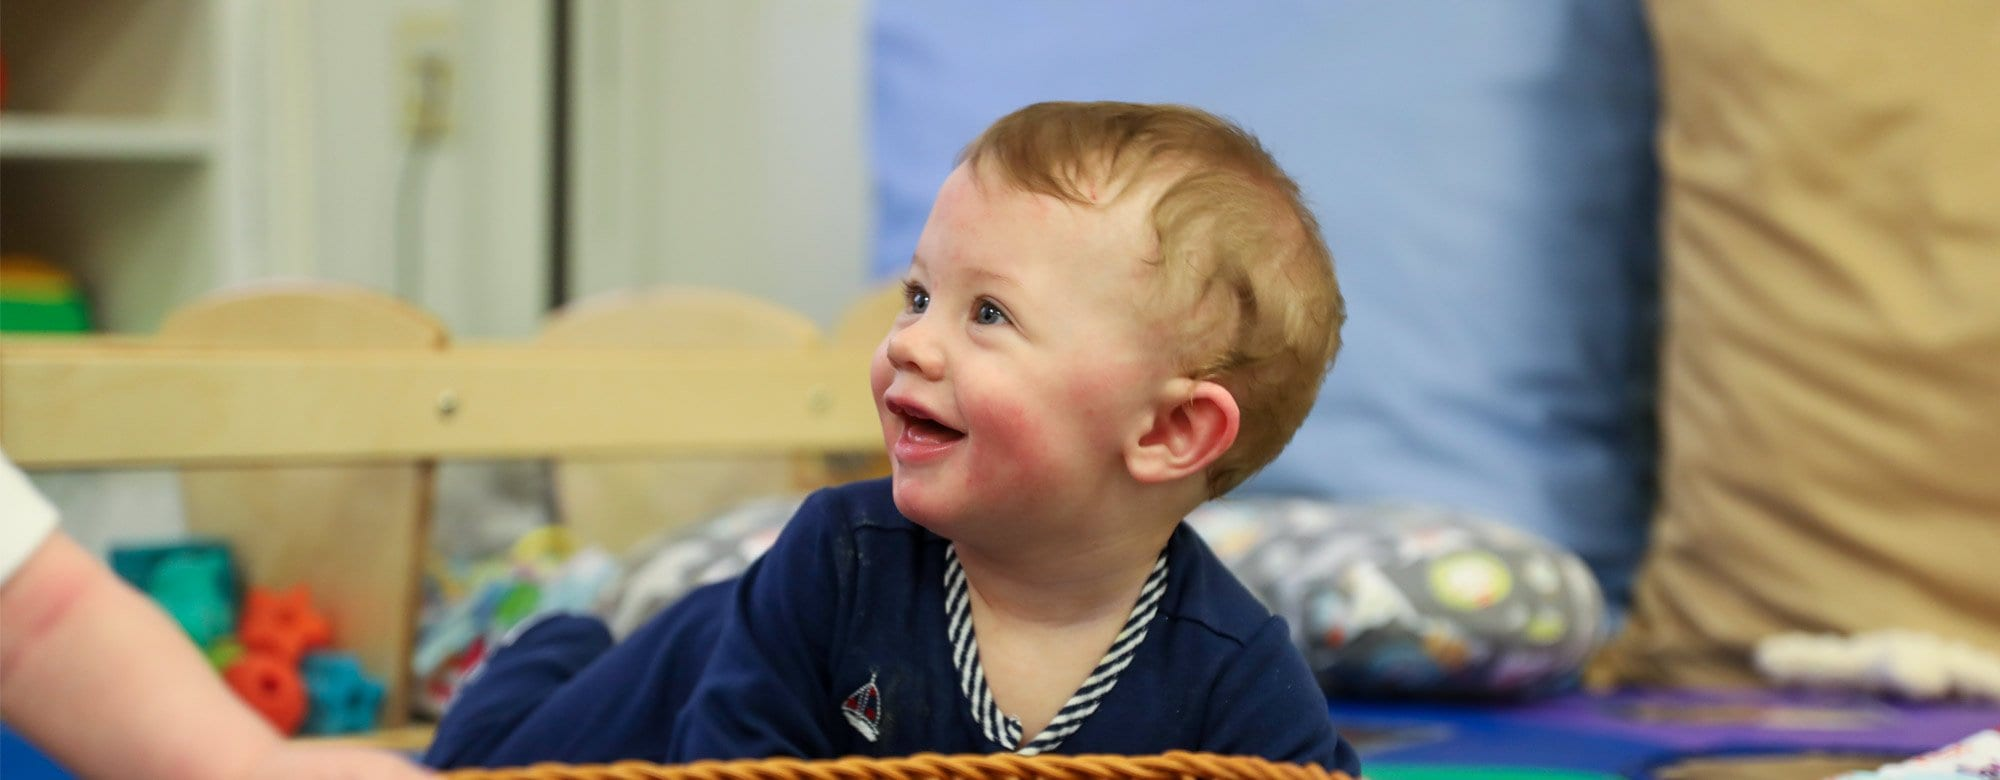 infant program header 3 baby playing at preschool